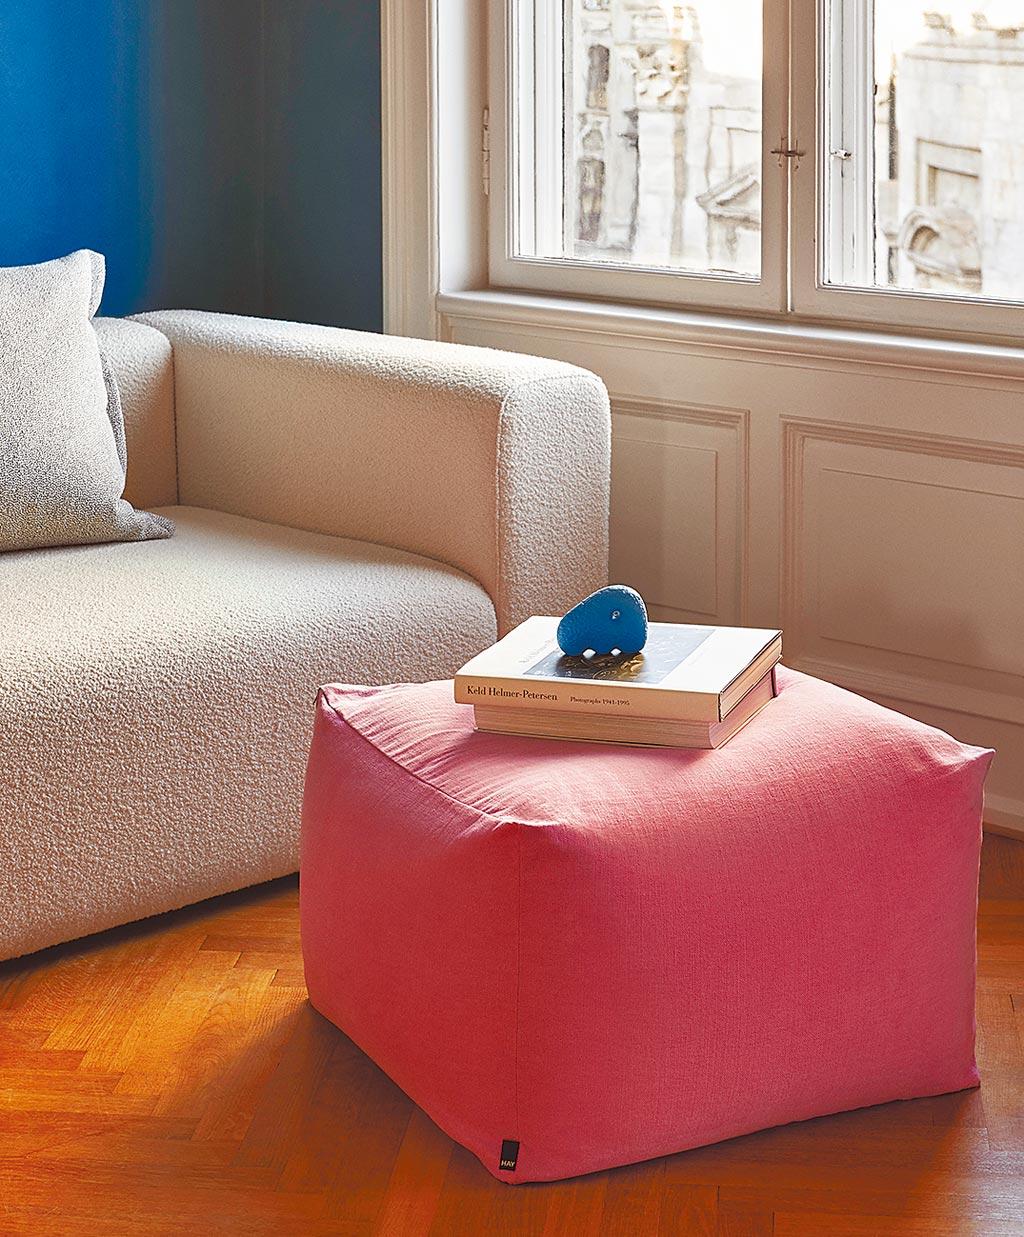 Hay的Pouf方糖懶骨頭,可作為茶几、腳凳使用,顏色多元,1萬980元。(Hay提供)